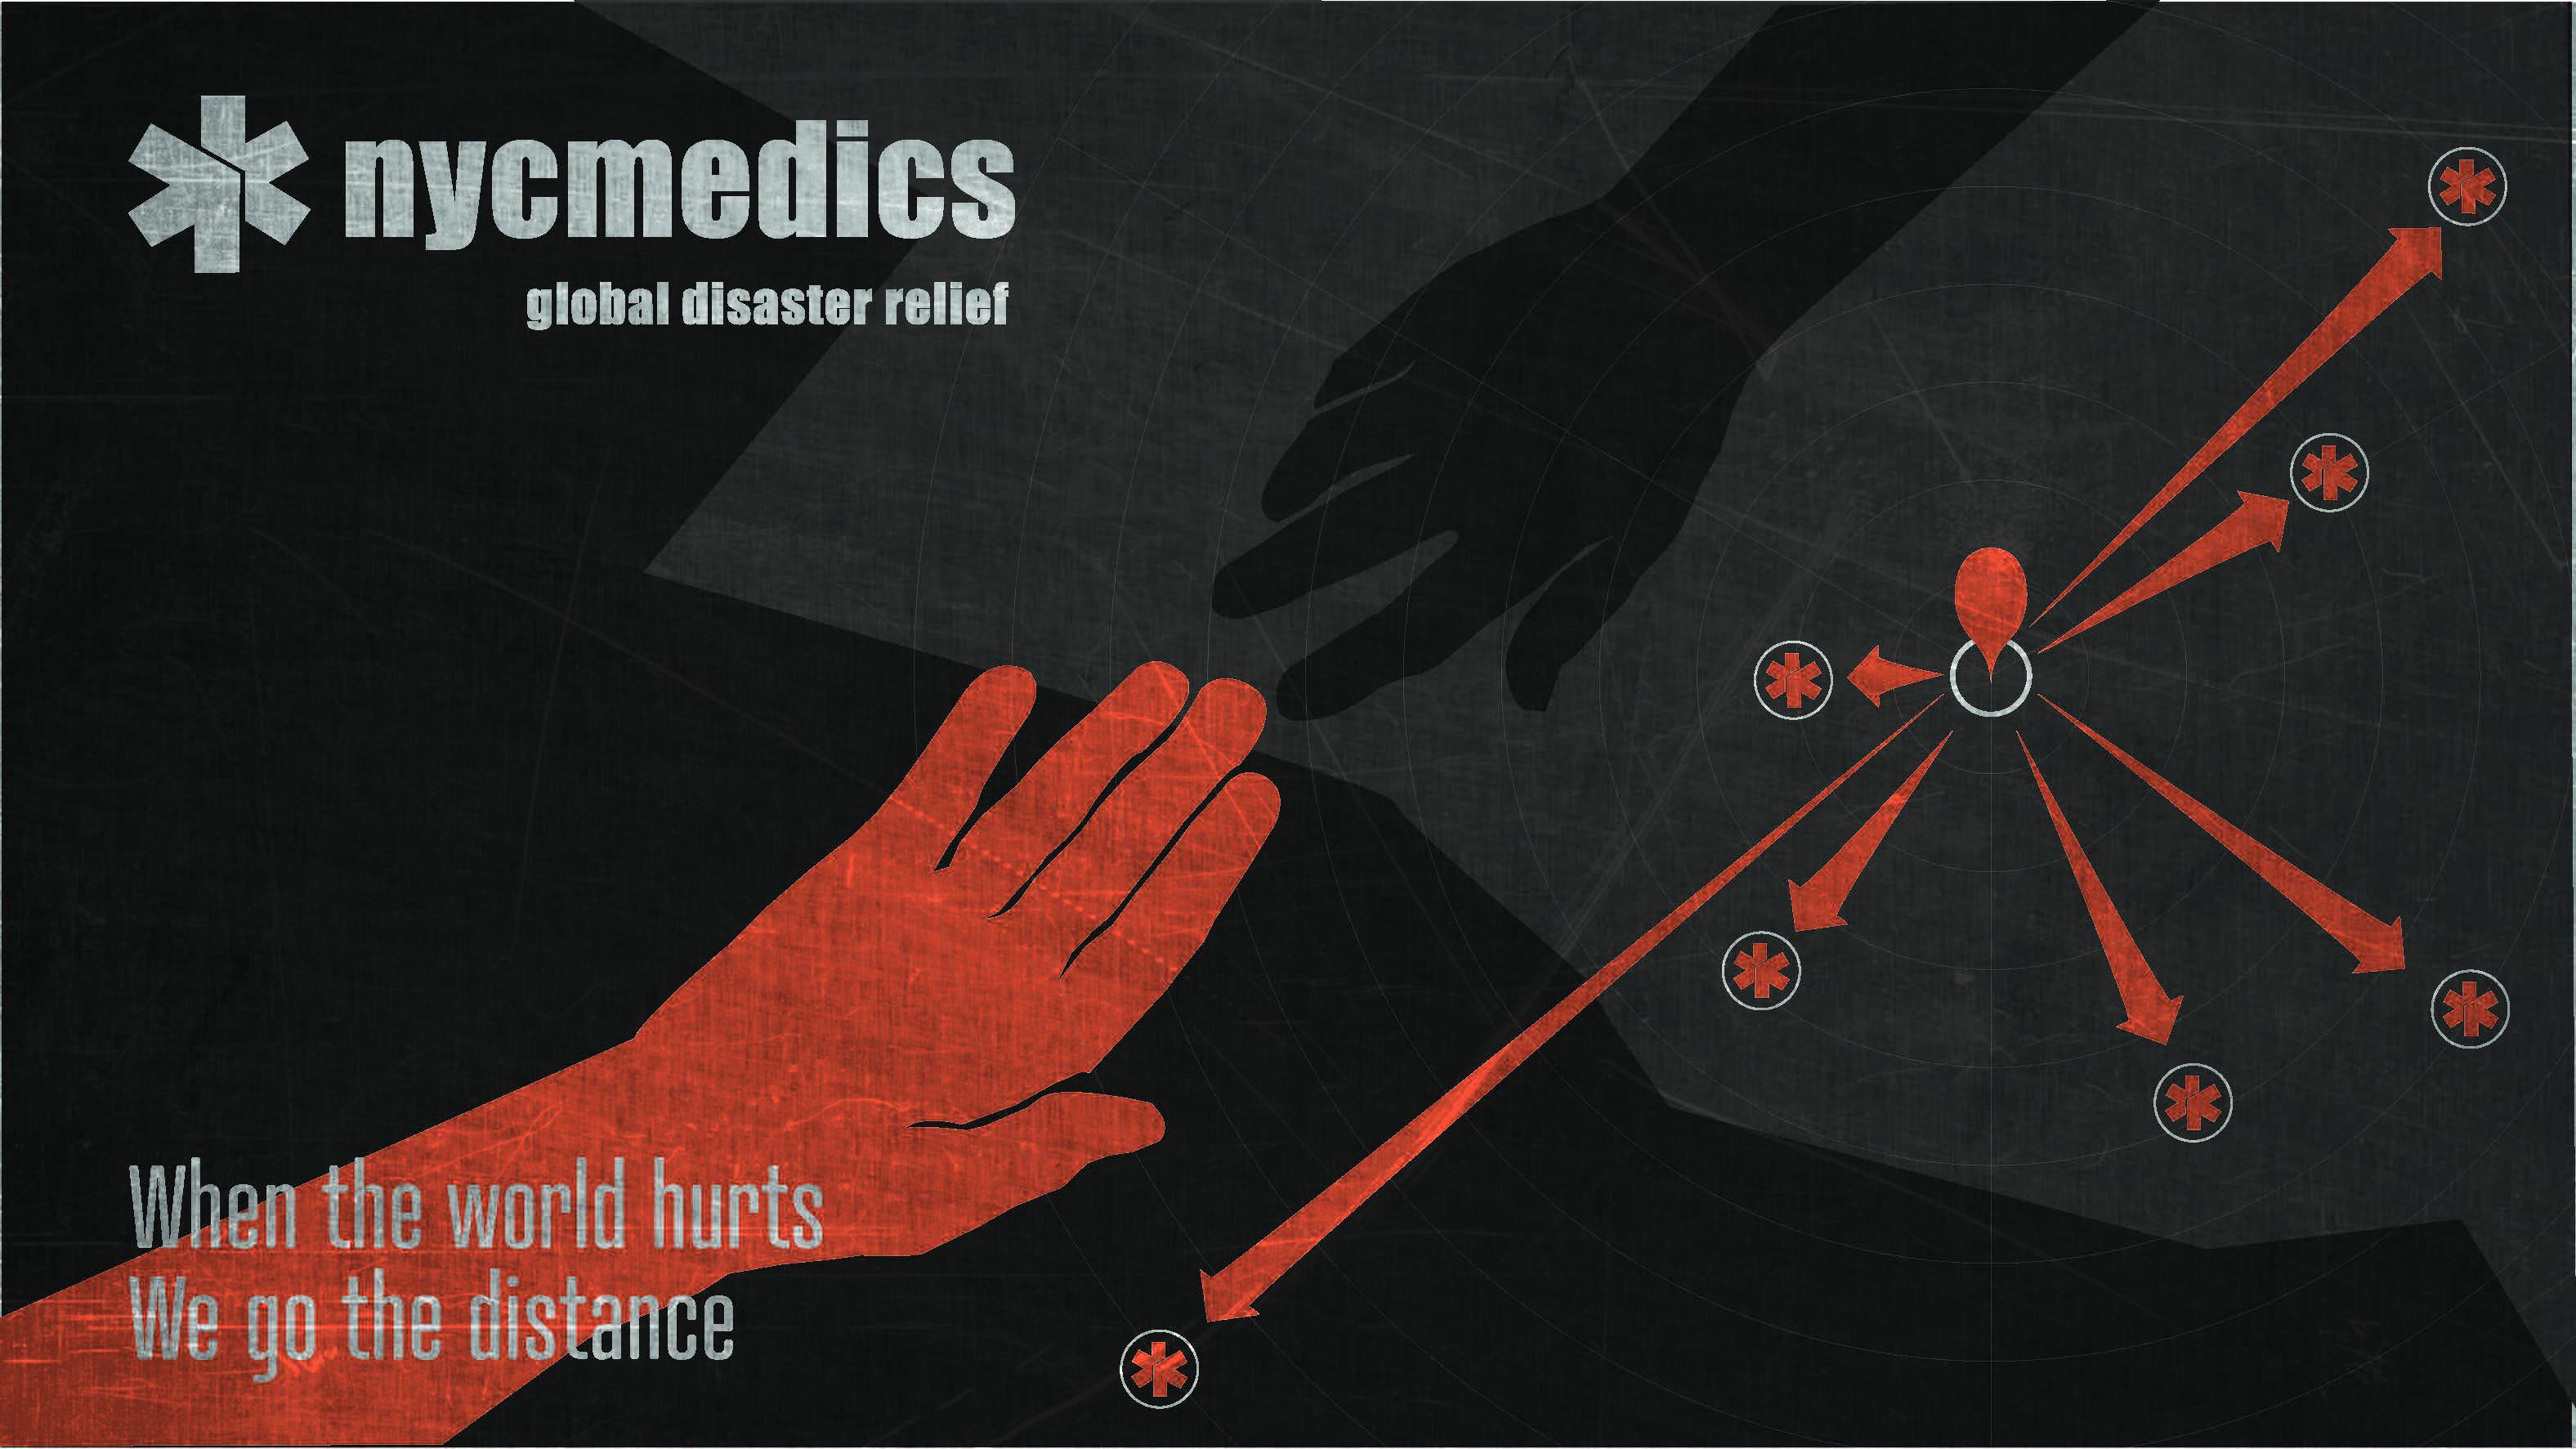 NYMedics-Concepts_DeShaCreative032918_Page_7